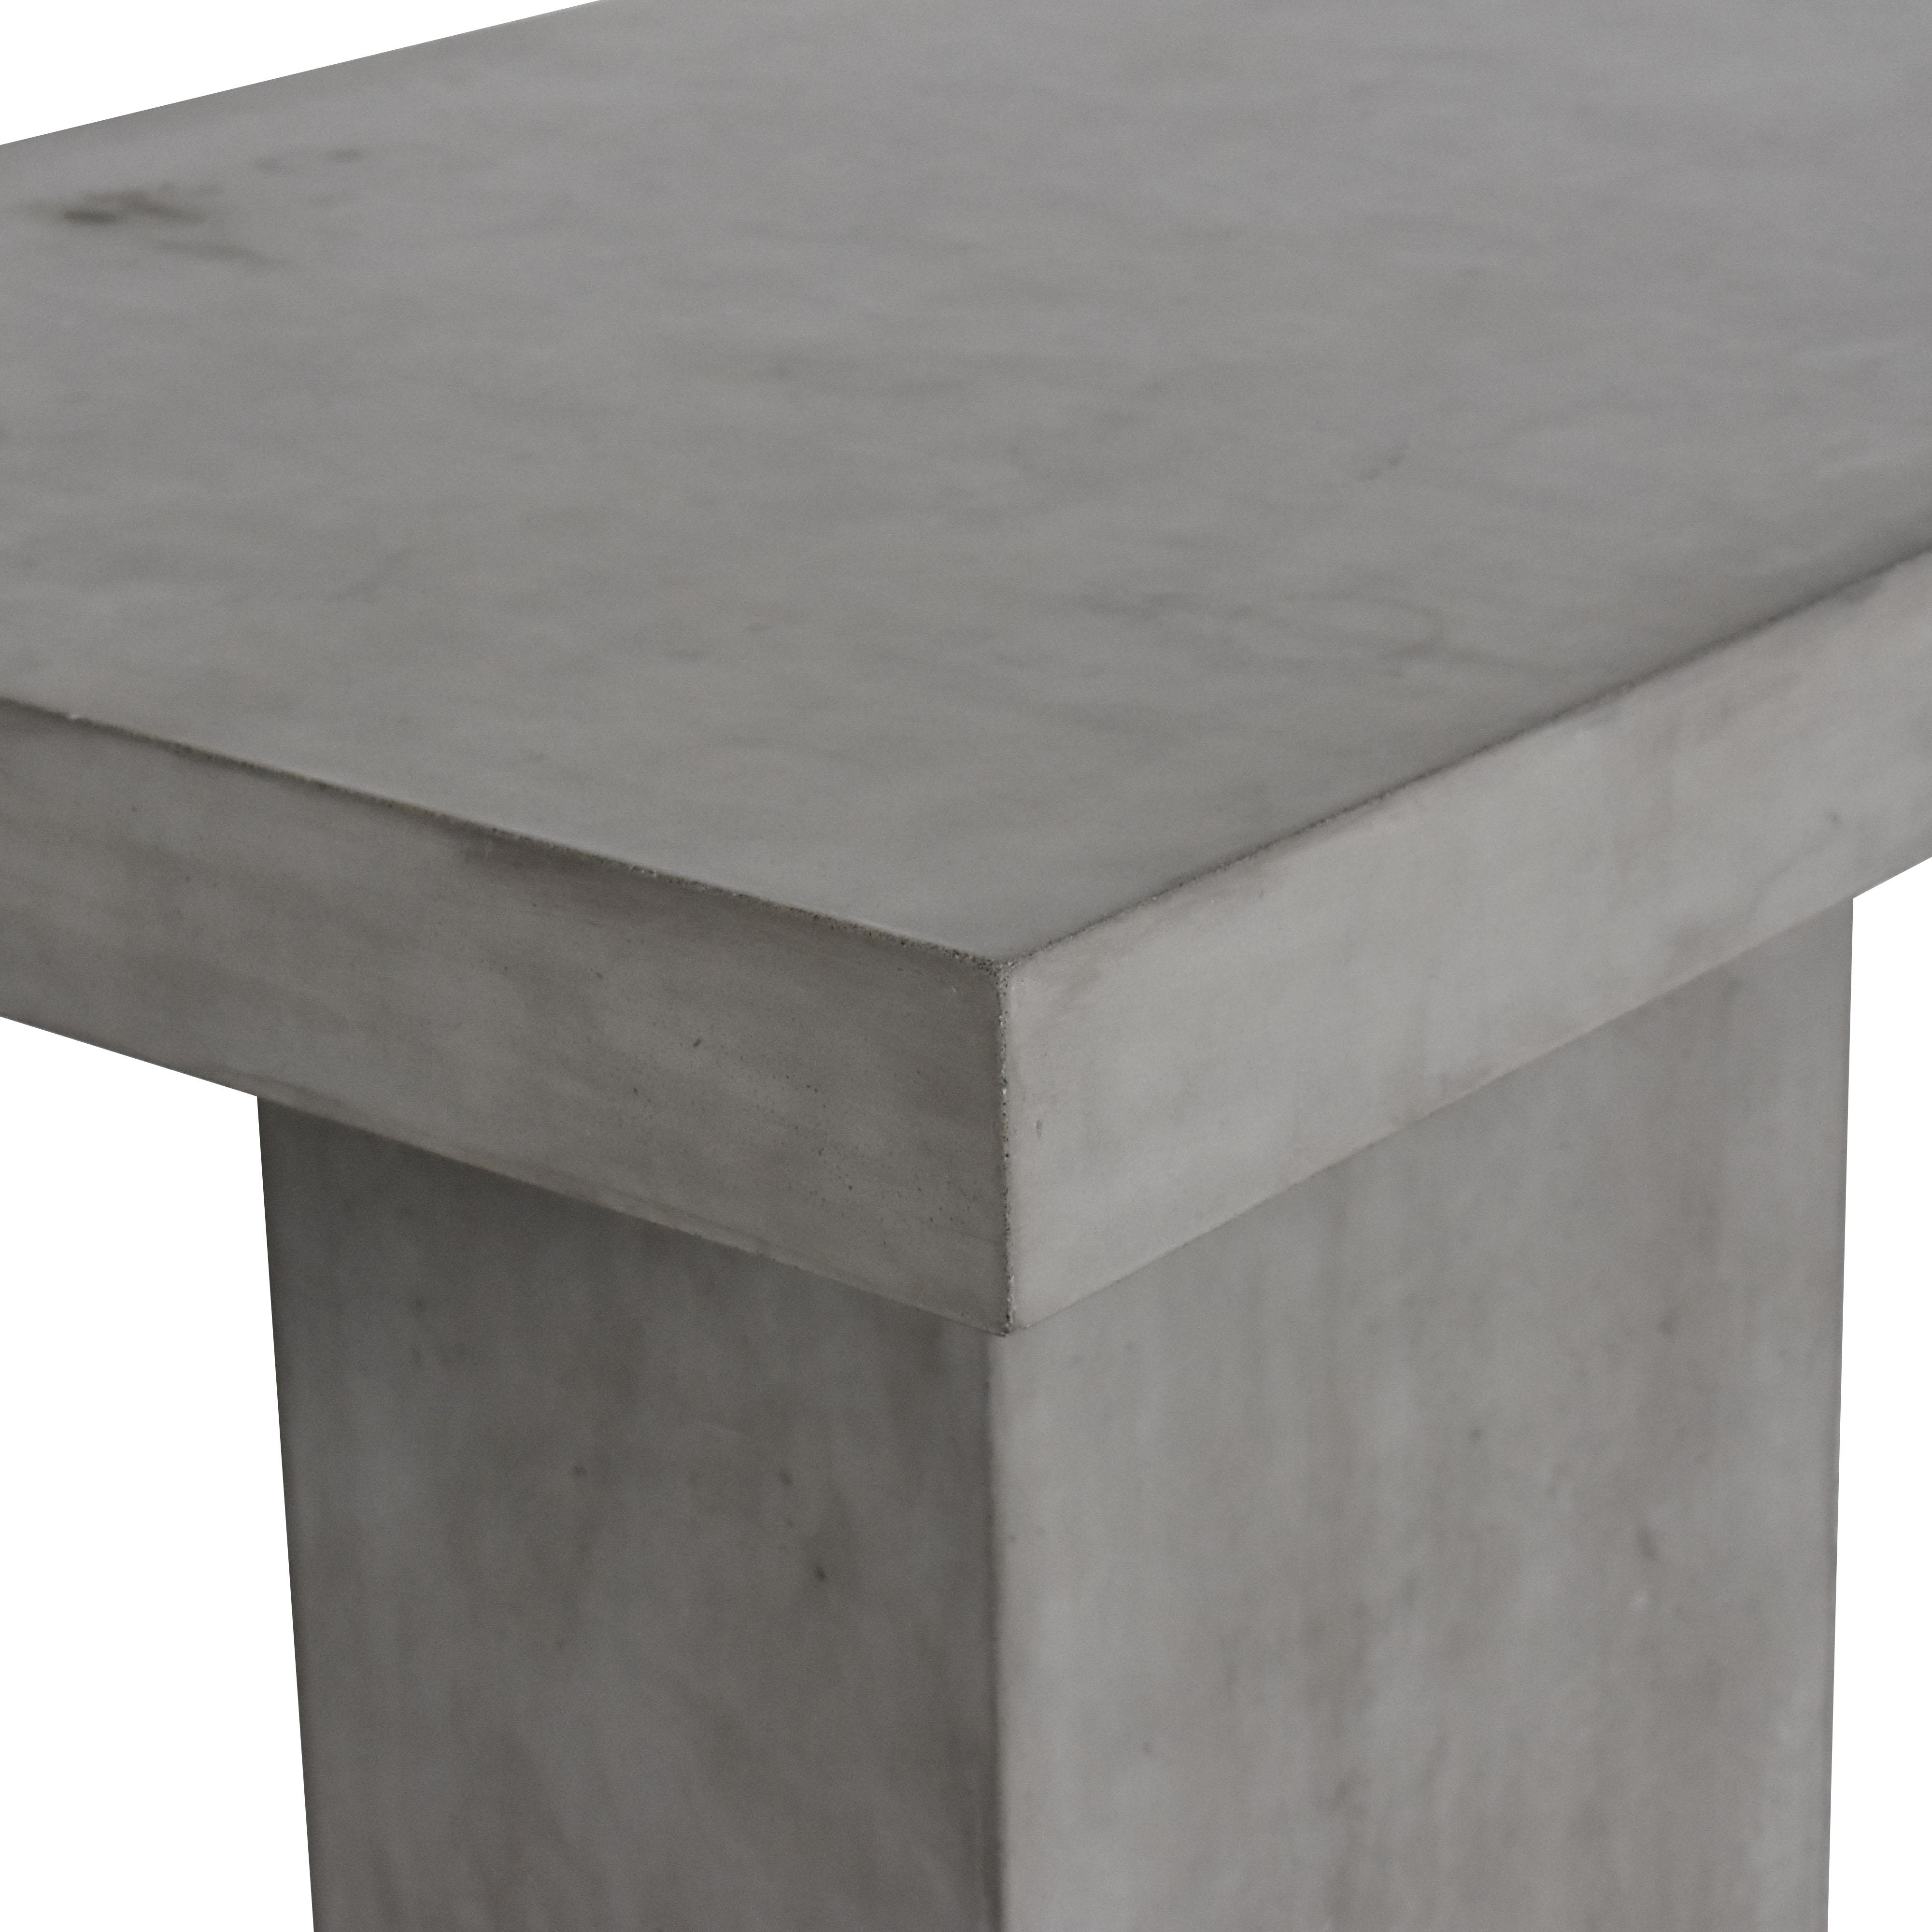 Seasonal Living Concrete Patio Table ma